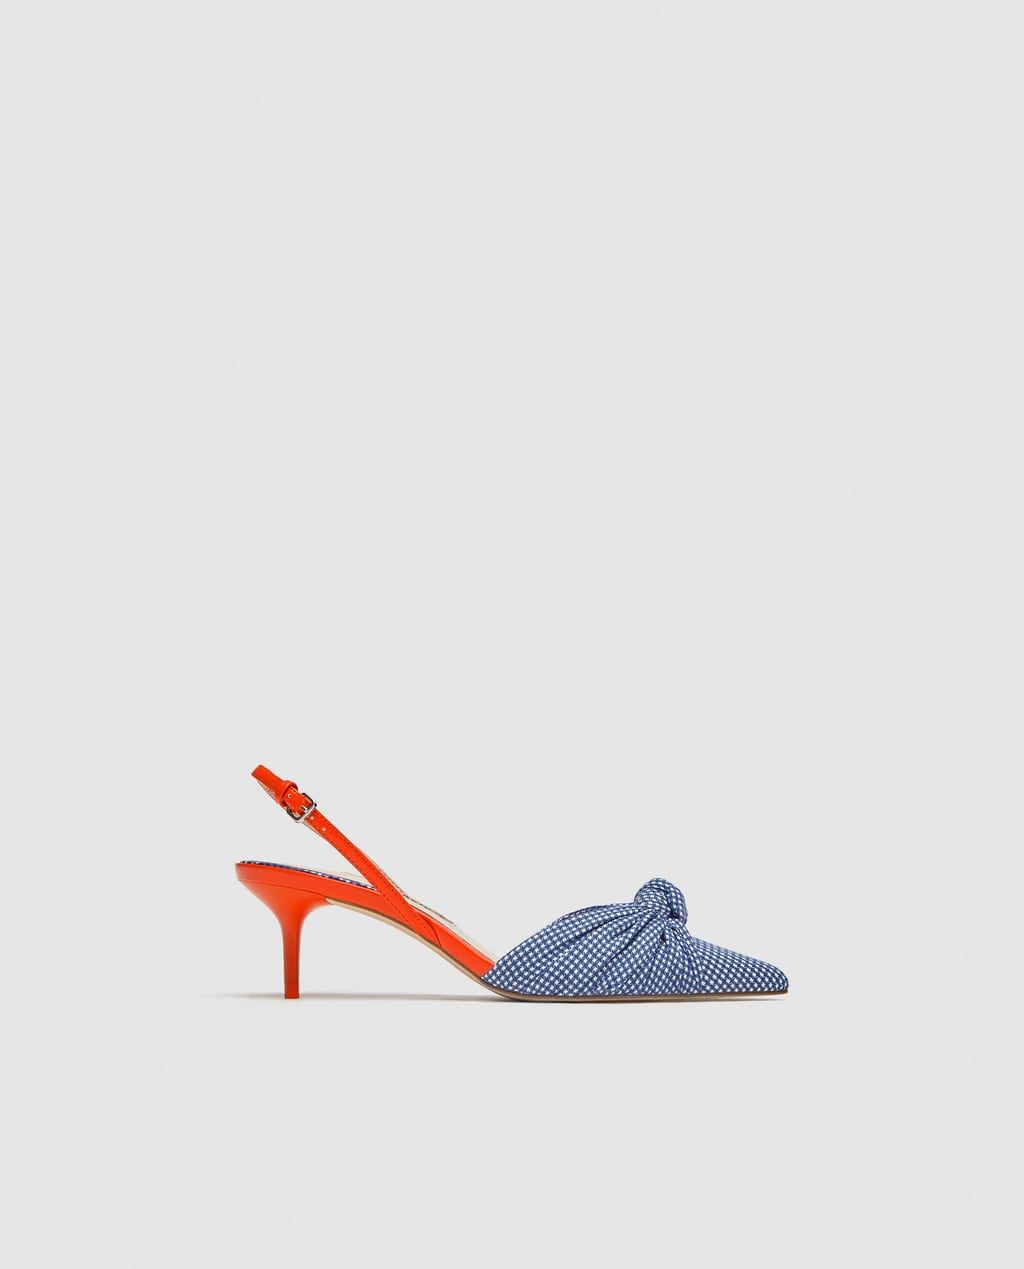 e7087cbc0d4 Image 1 of GINGHAM MID-HEEL SLINGBACK SHOES from Zara | Ayakkabılar ...